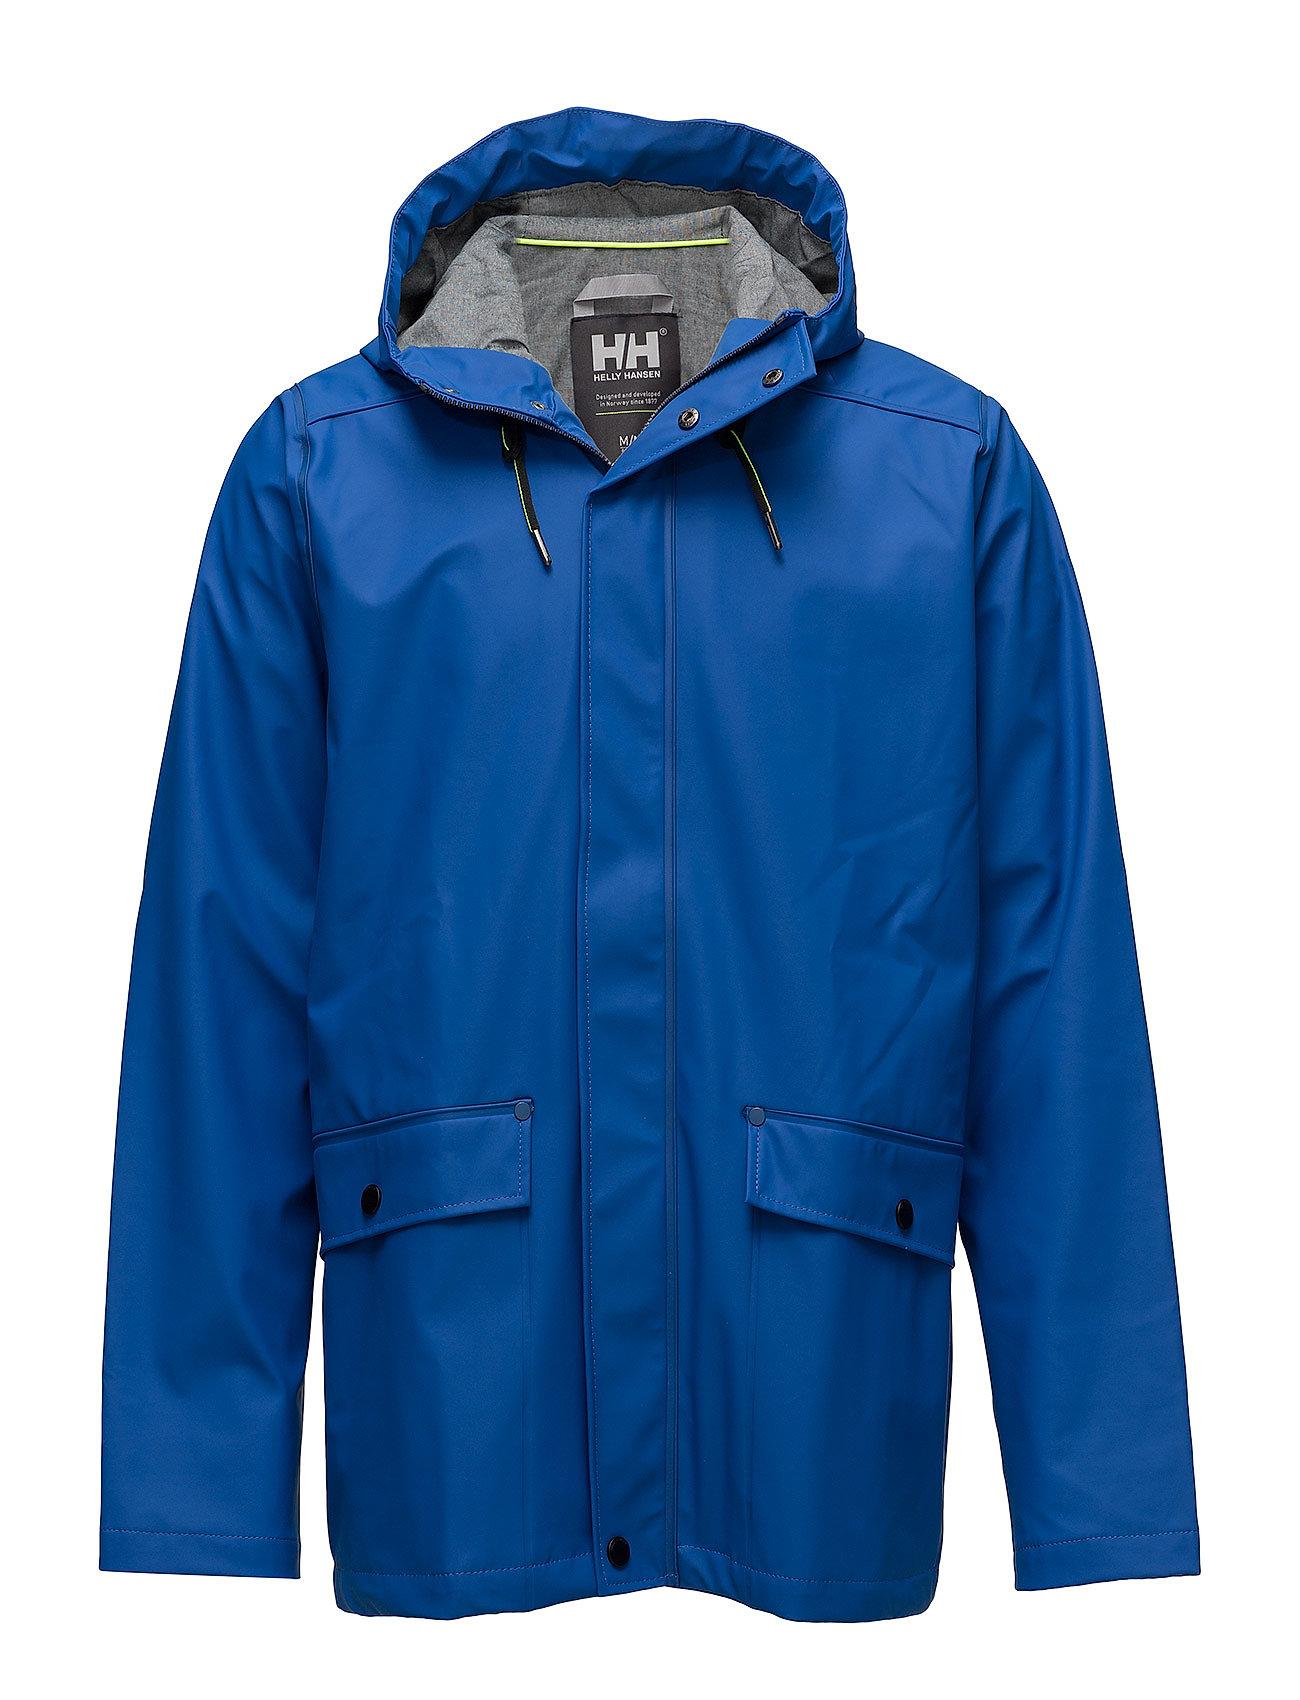 47beaa28 Lerwick Jacket (563 Olympian Blue) (£62) - Helly Hansen - | Boozt.com